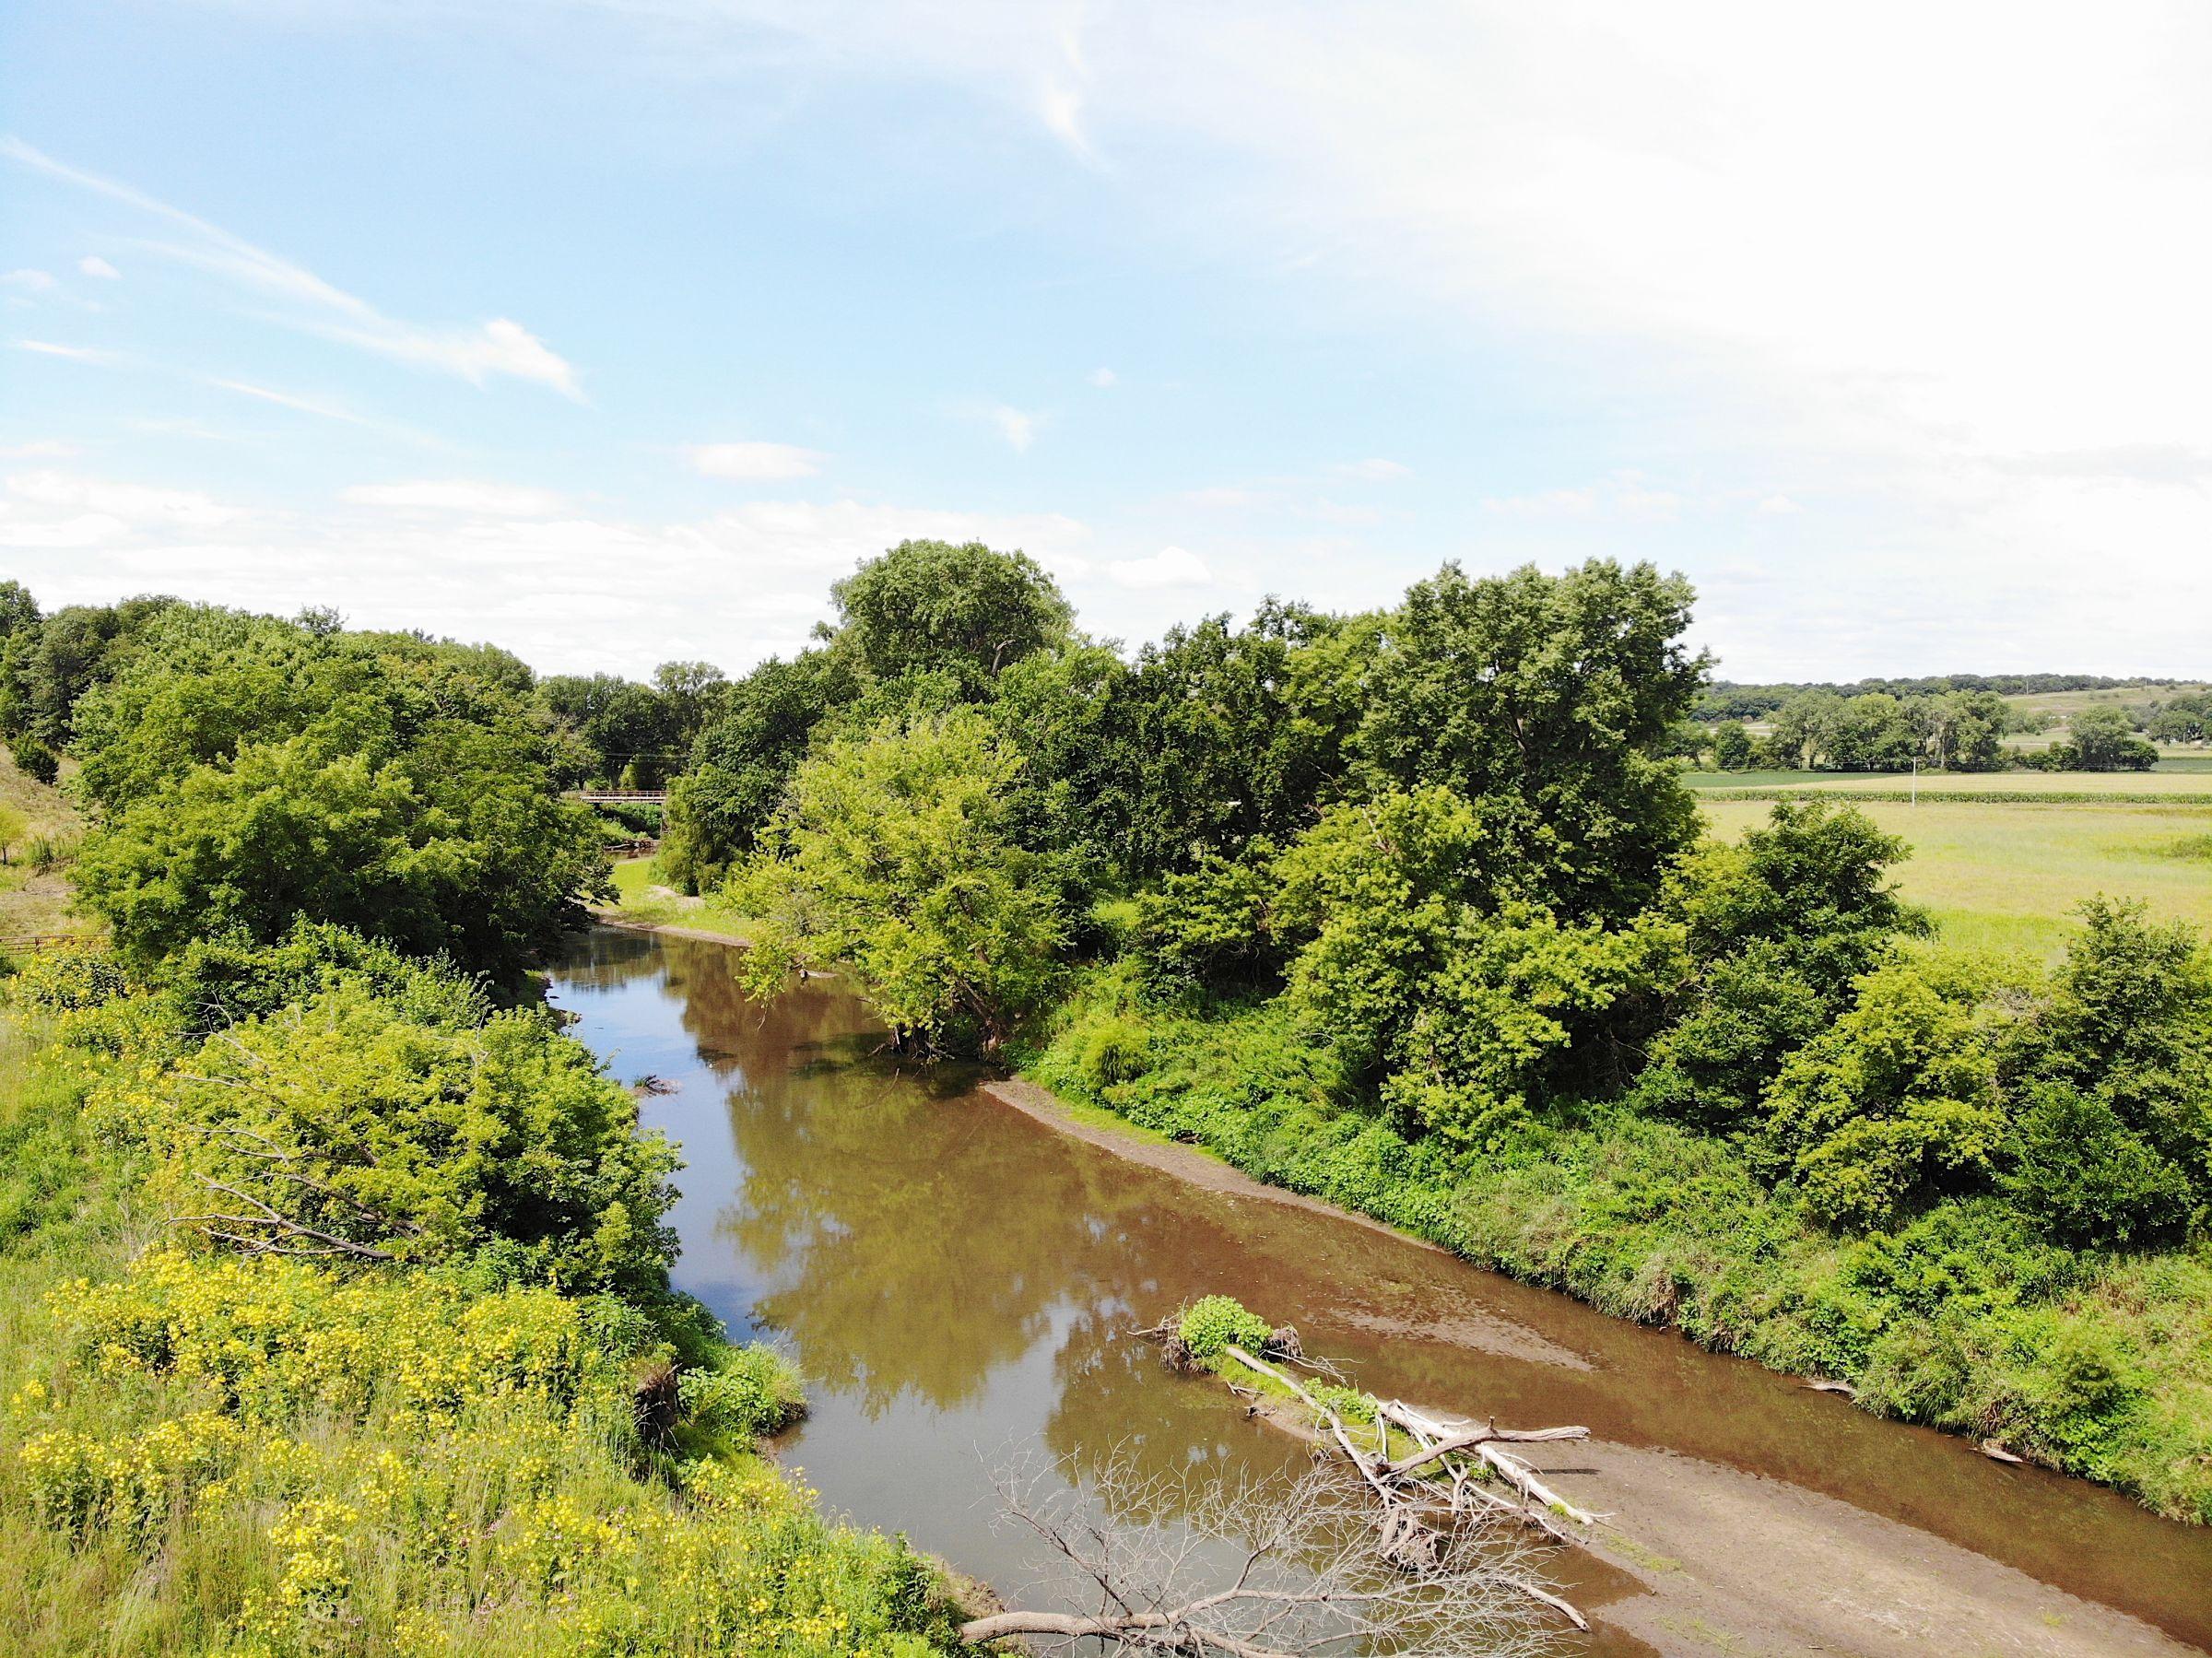 land-warren-county-iowa-84-acres-listing-number-15103-7-2020-08-05-144425.jpg